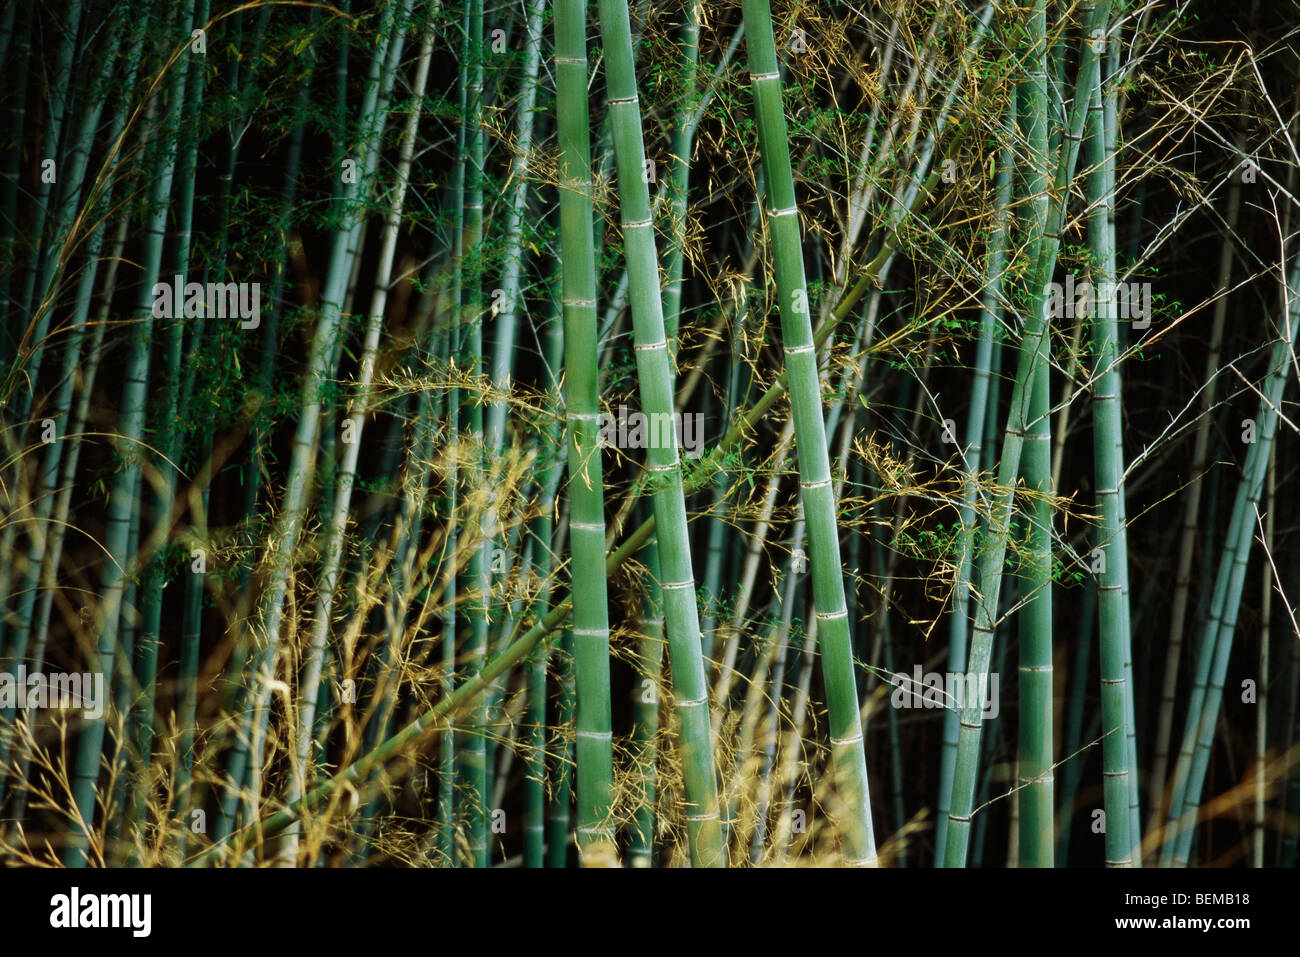 Bamboo grove, Japan Stock Photo